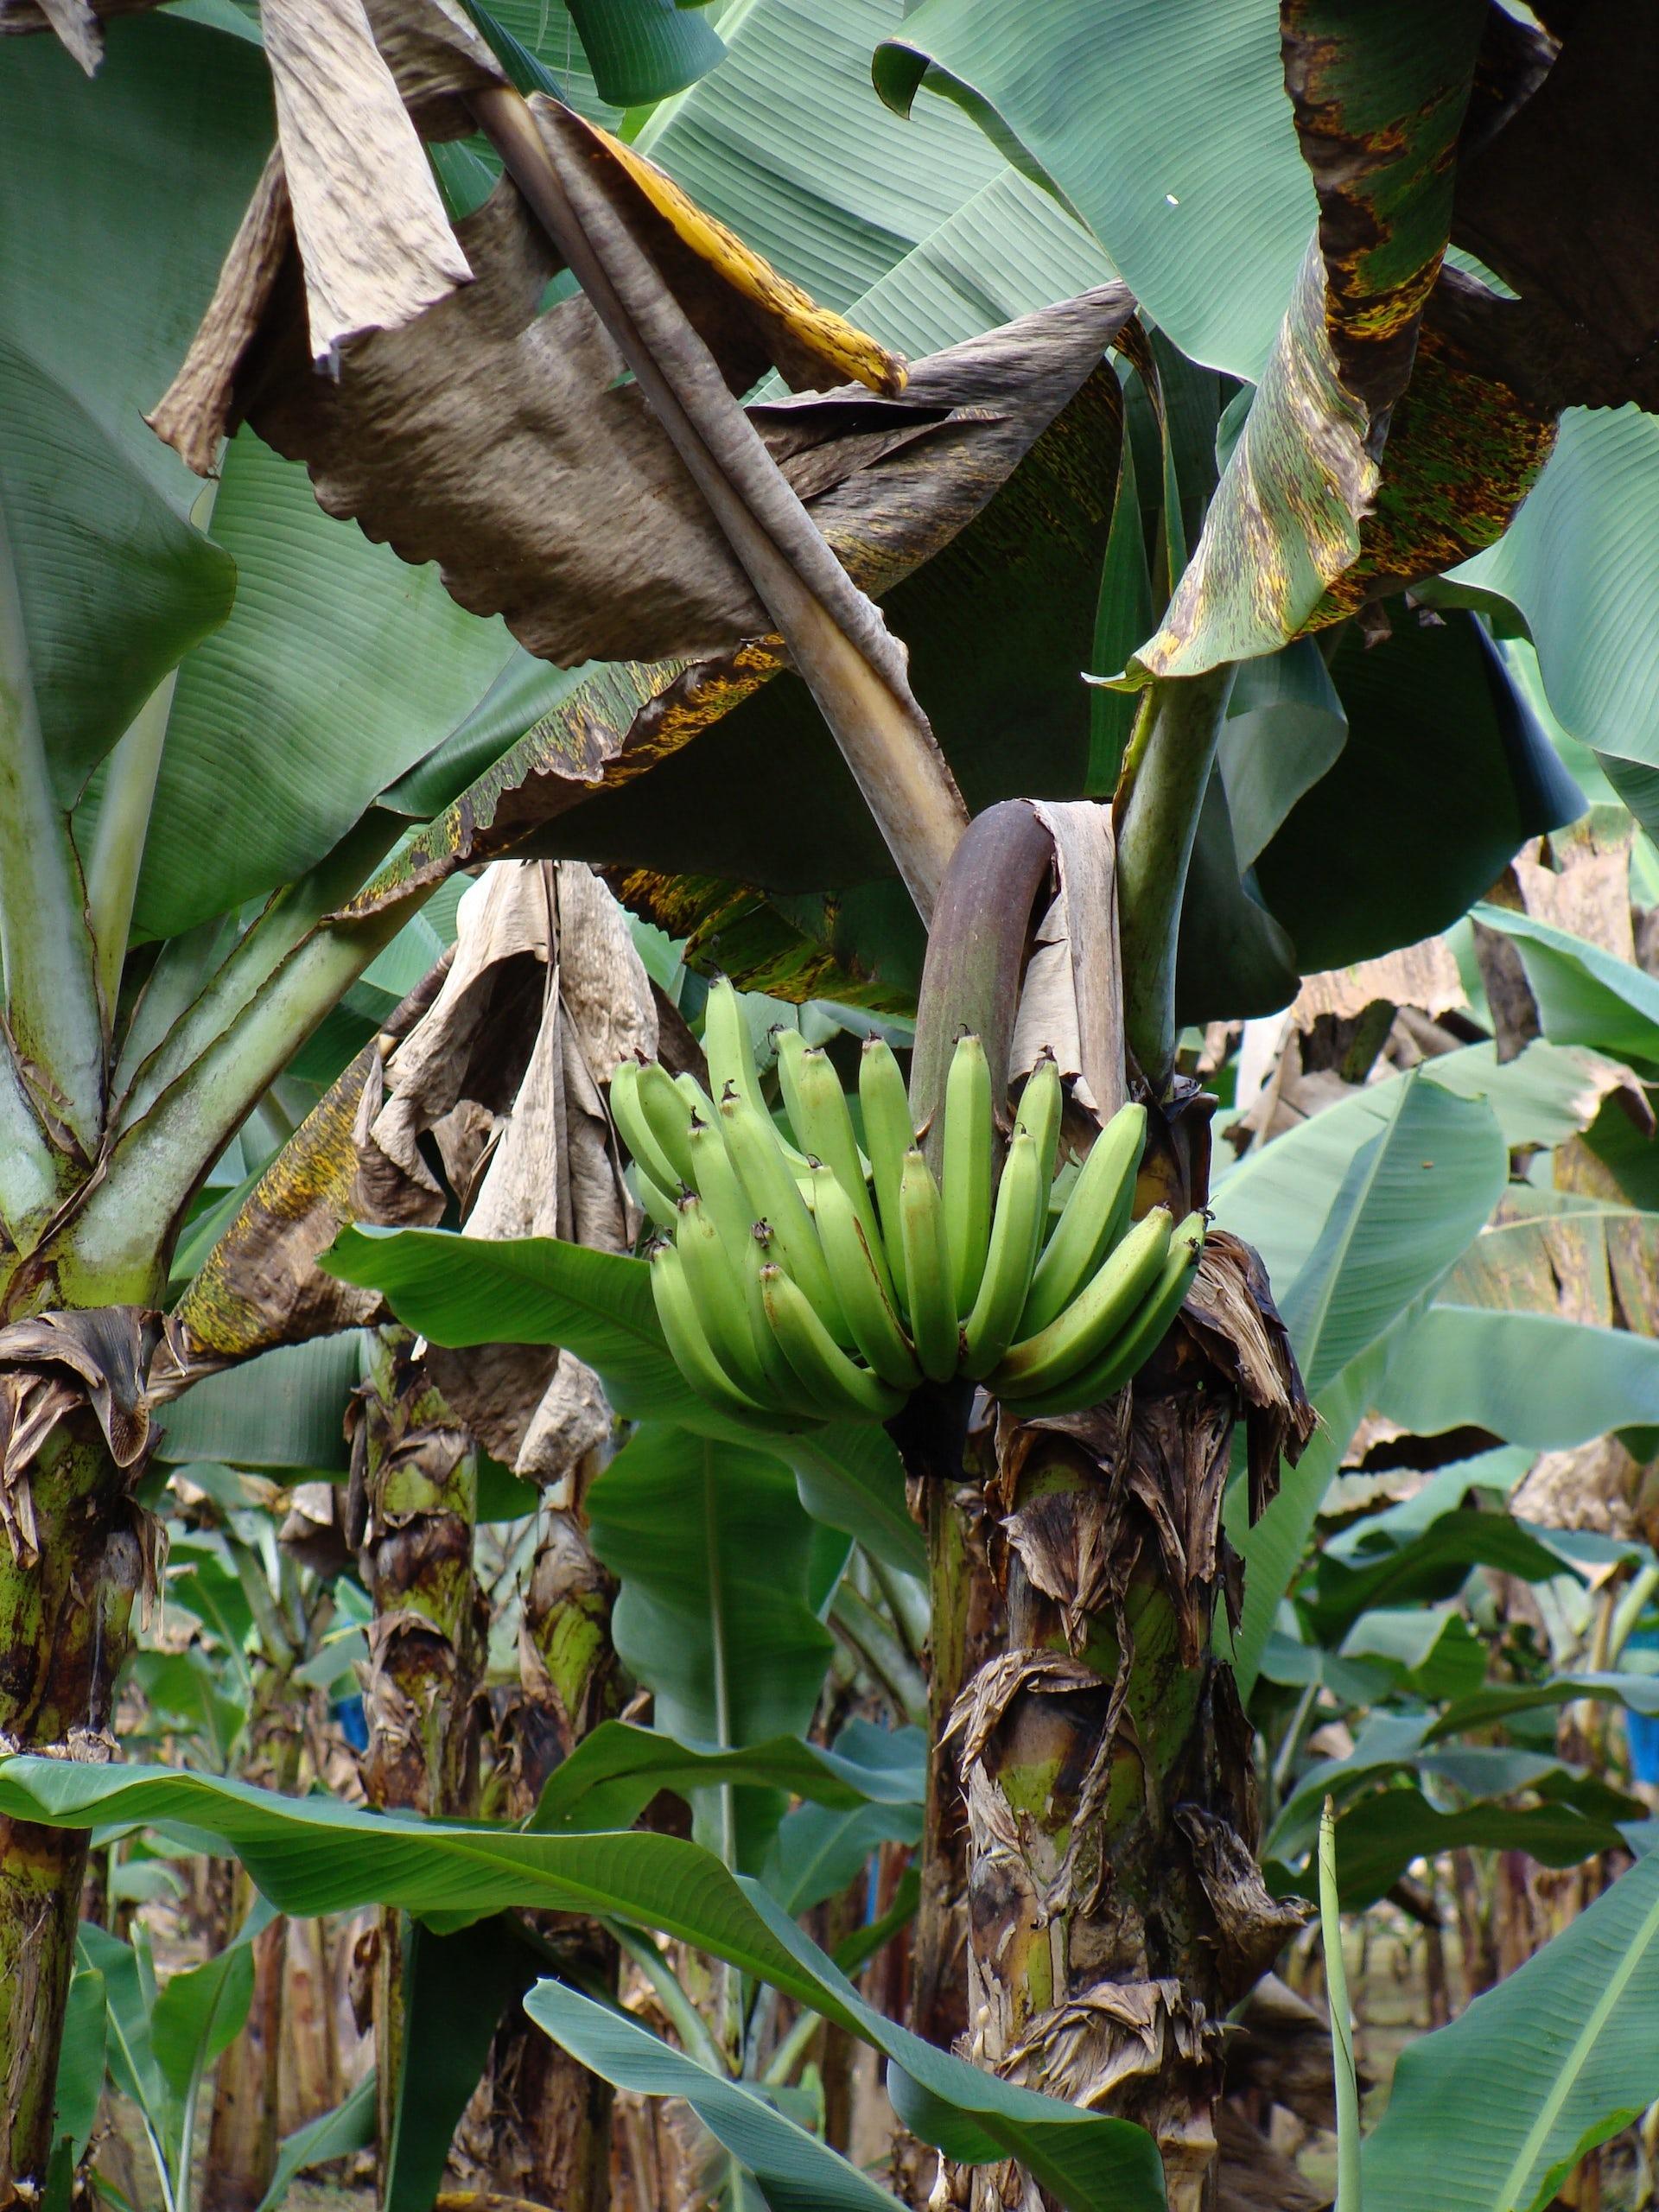 Benefits of producing banana plants asexually